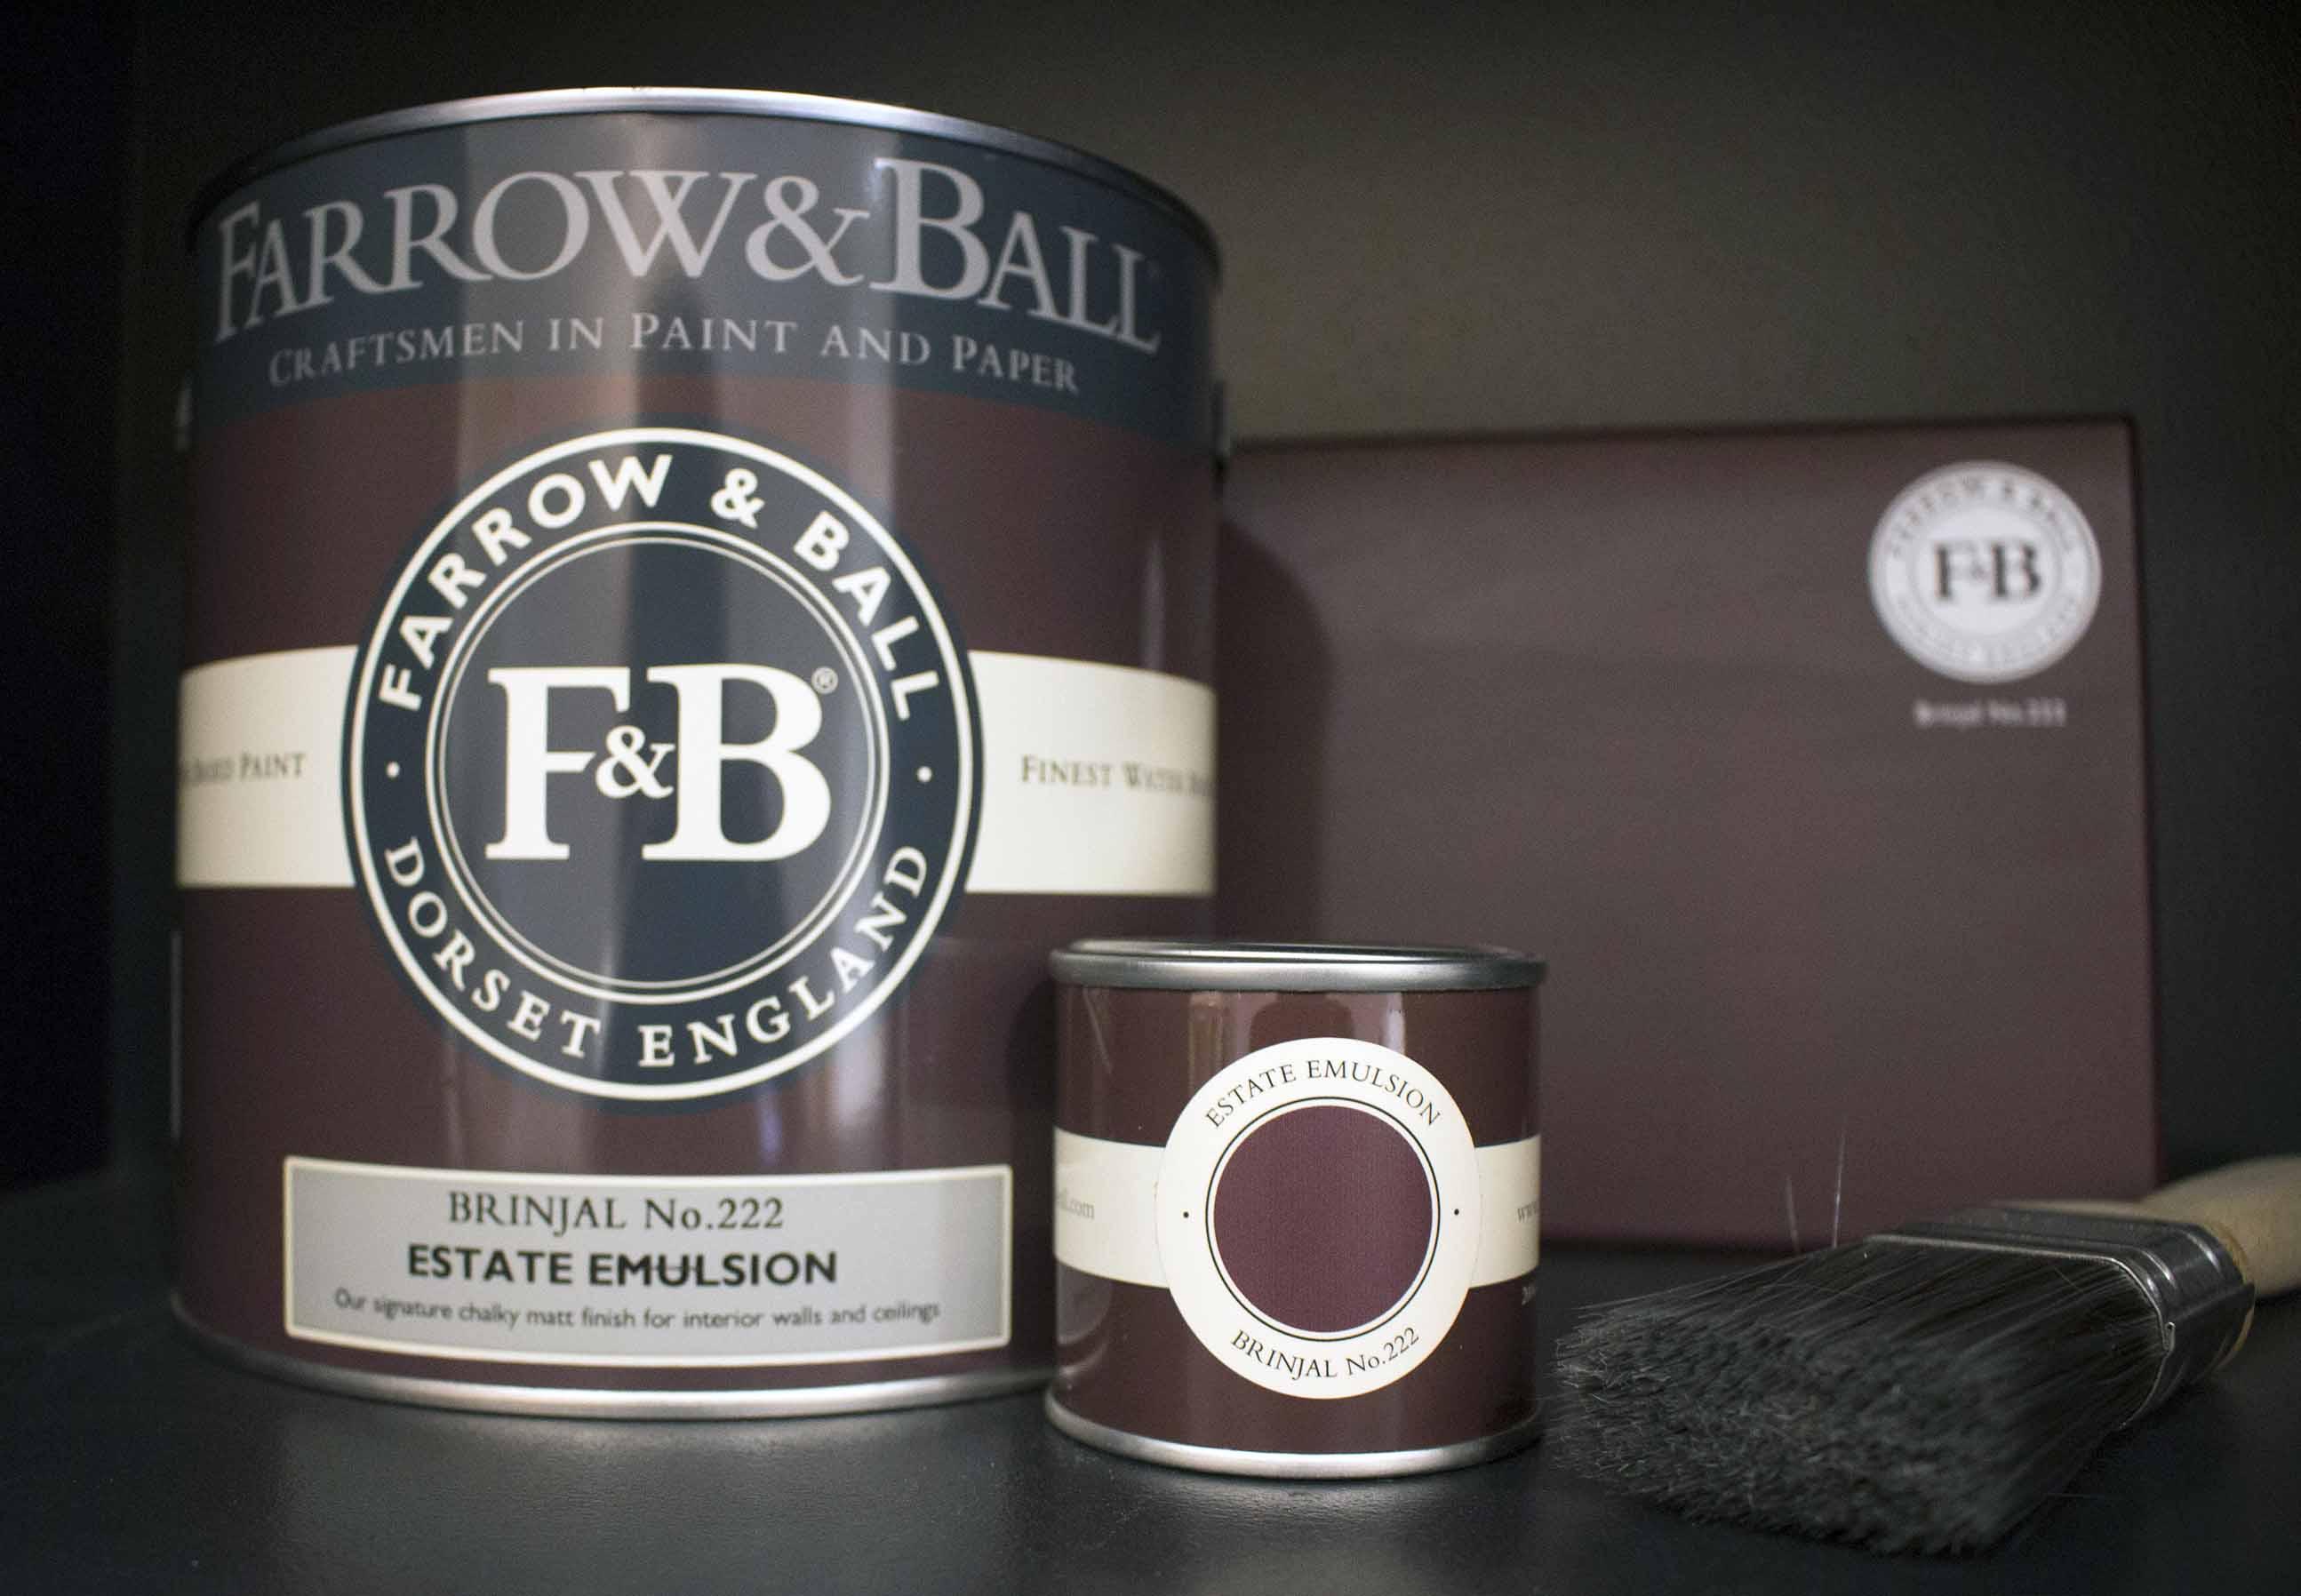 farrow&ball, farrow and ball, paint, decorating, paint brush, brinjal